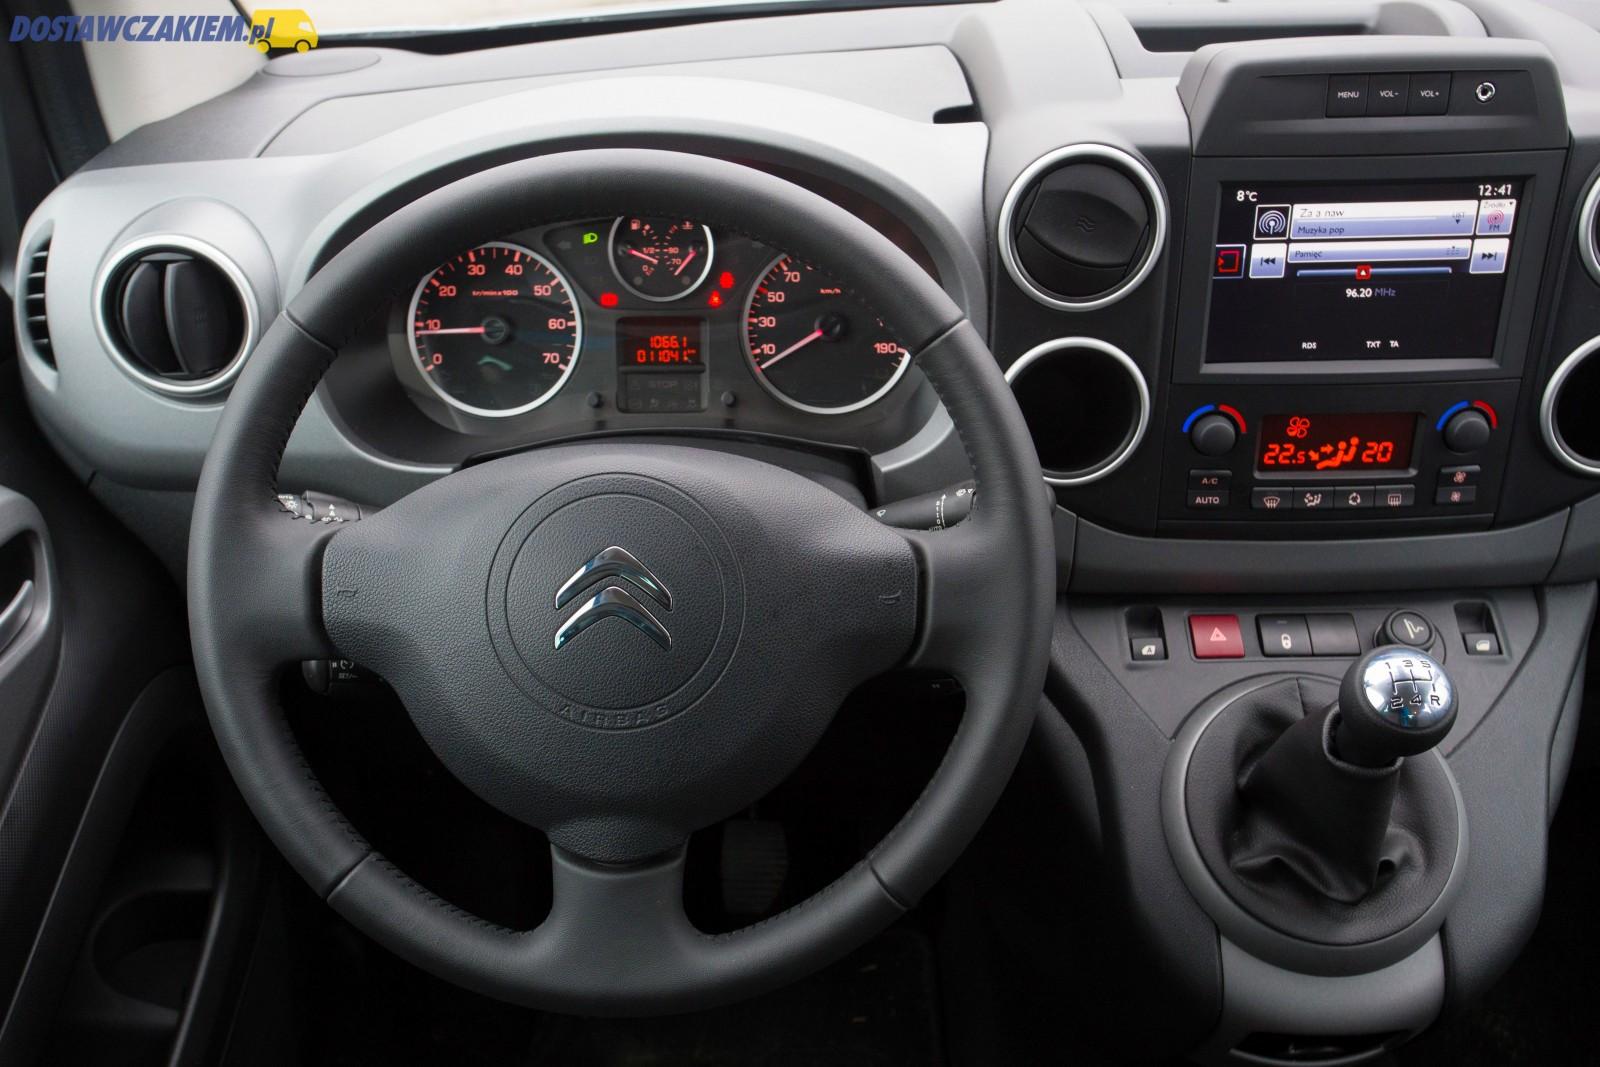 Test Citroën Berlingo II Multispace 1 6 HDi 100 KM